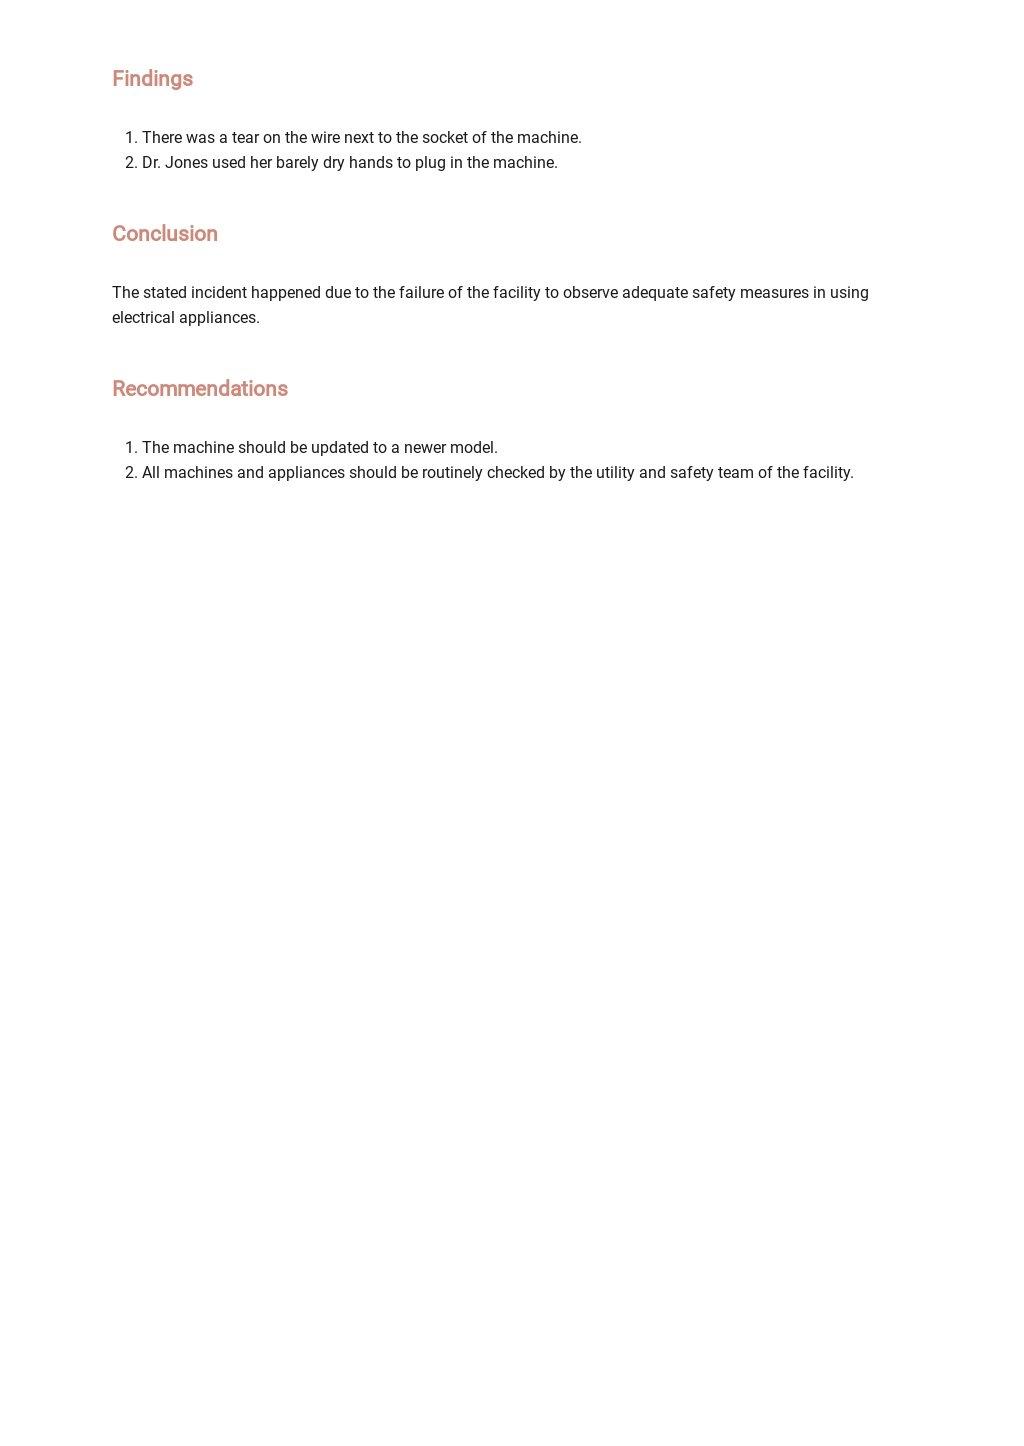 Printable Employee Incident Report Template 2.jpe